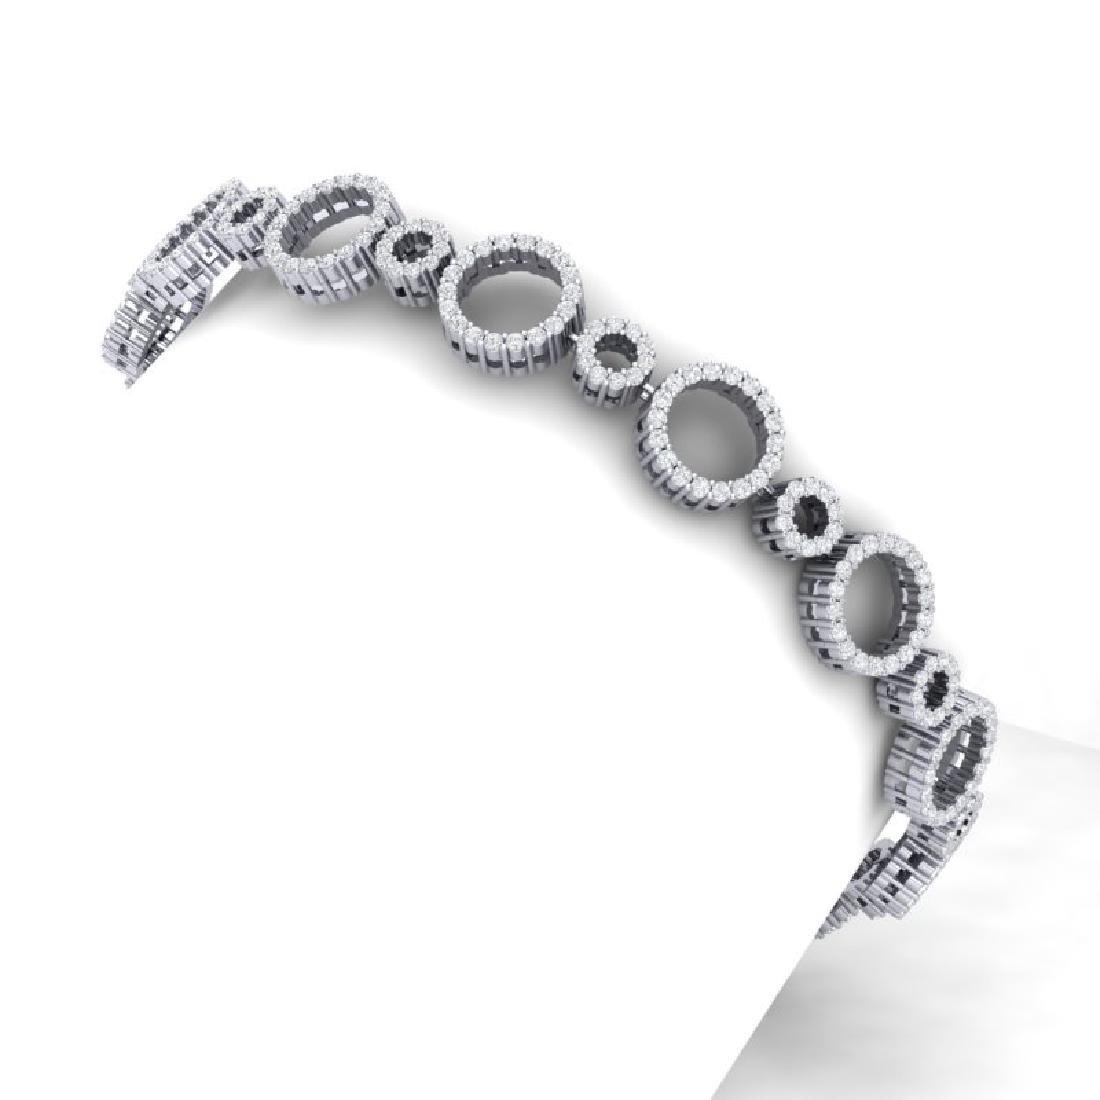 4 CTW Certified SI/I Diamond Halo Bracelet 18K White